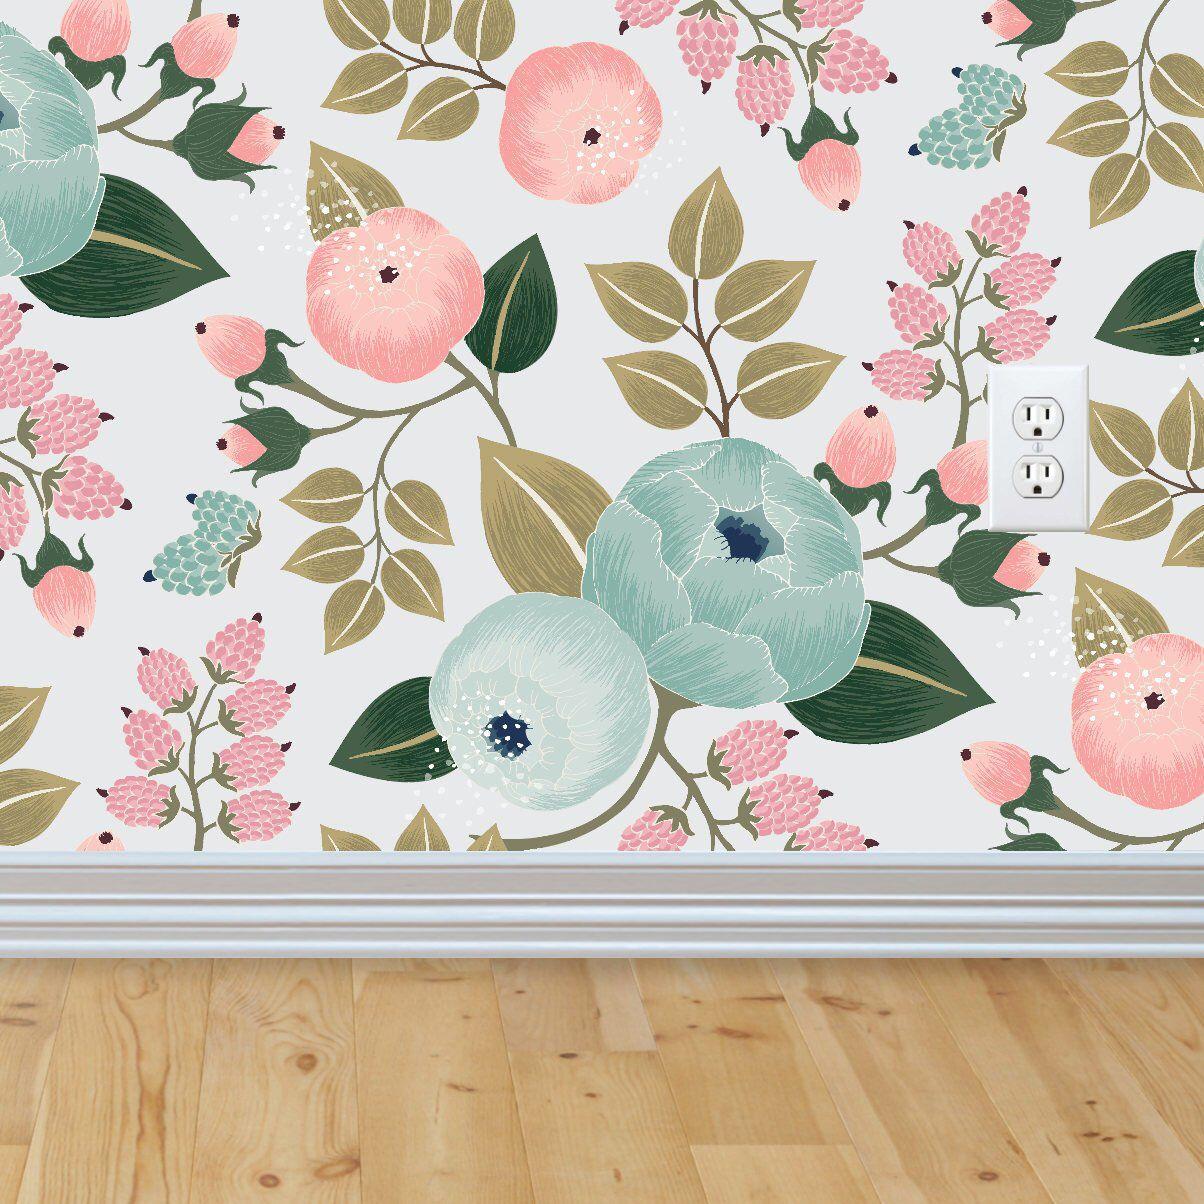 Blossom Wallpaper, Removable Wallpaper, Baby Girl Nursery